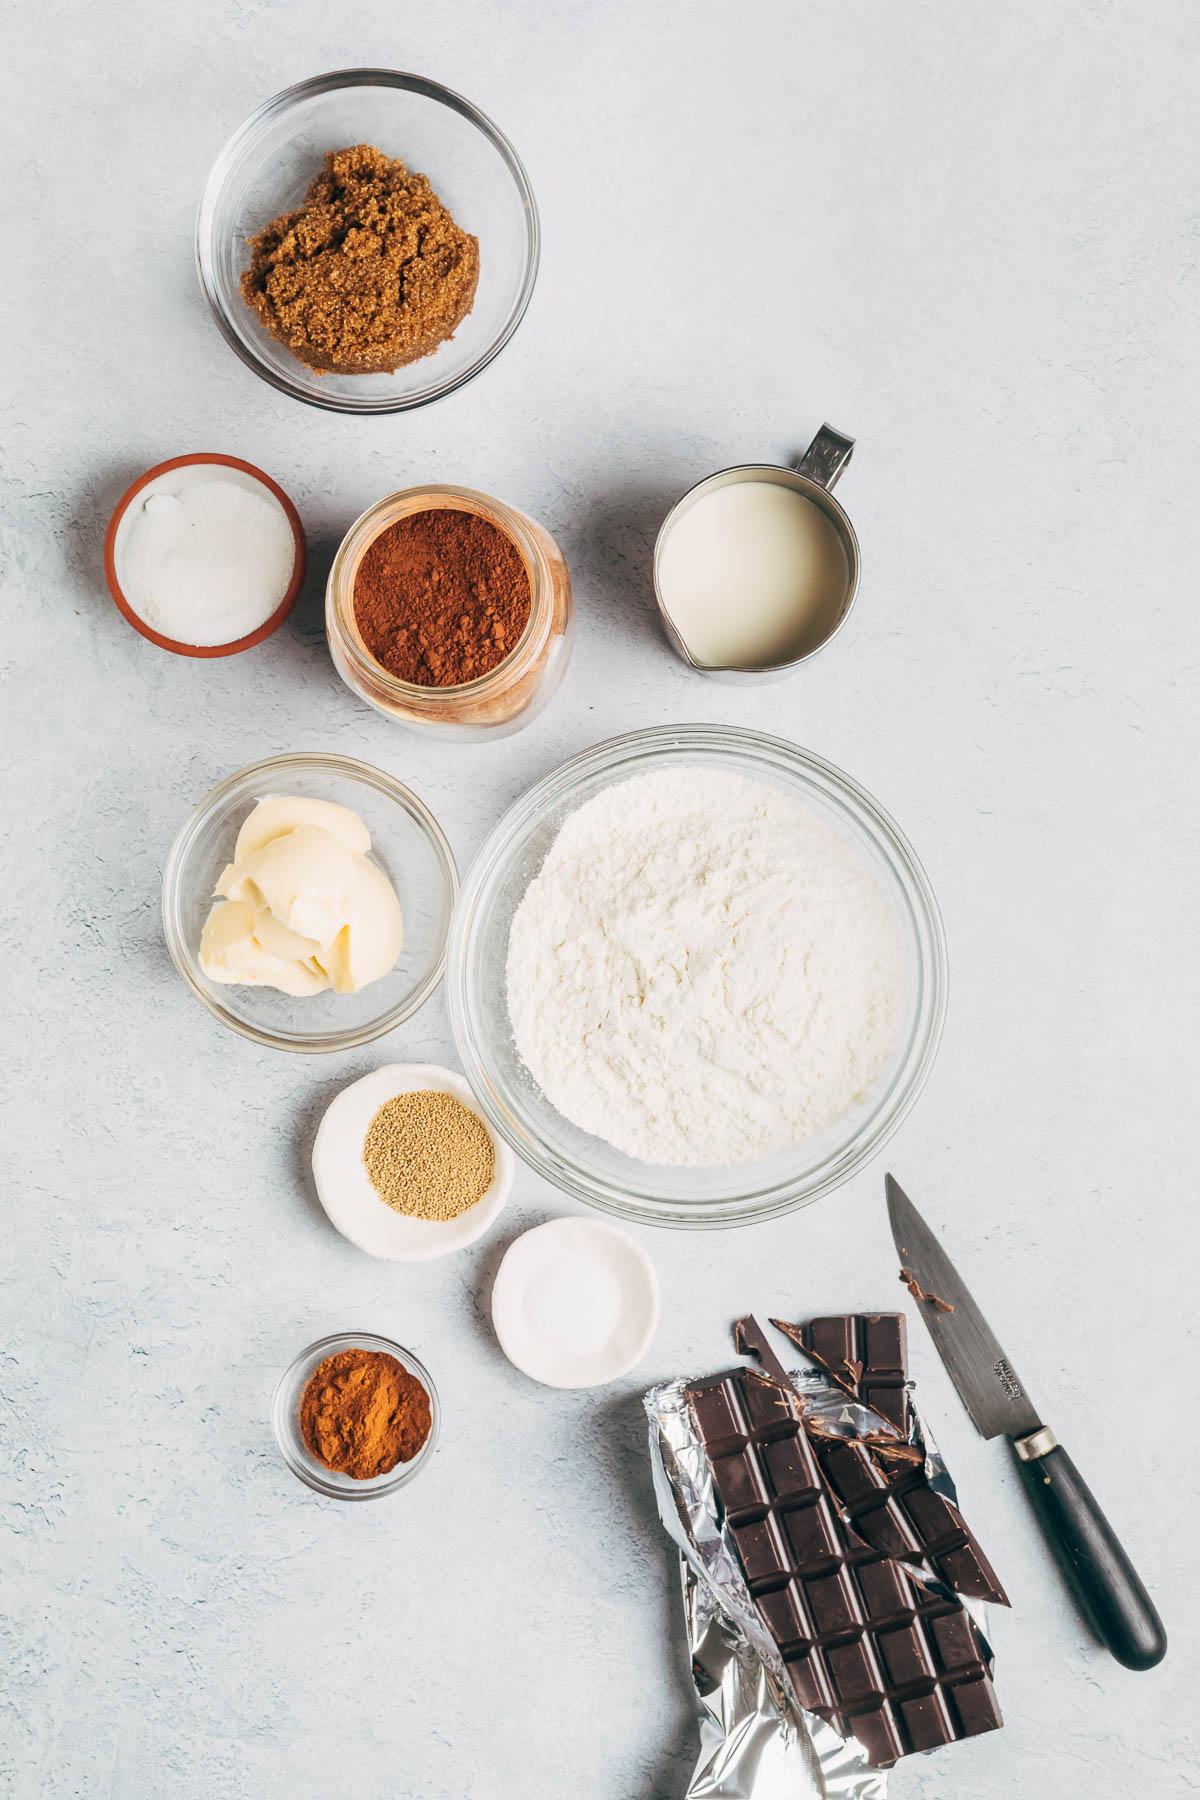 Chocolate cinnamon roll ingredients.